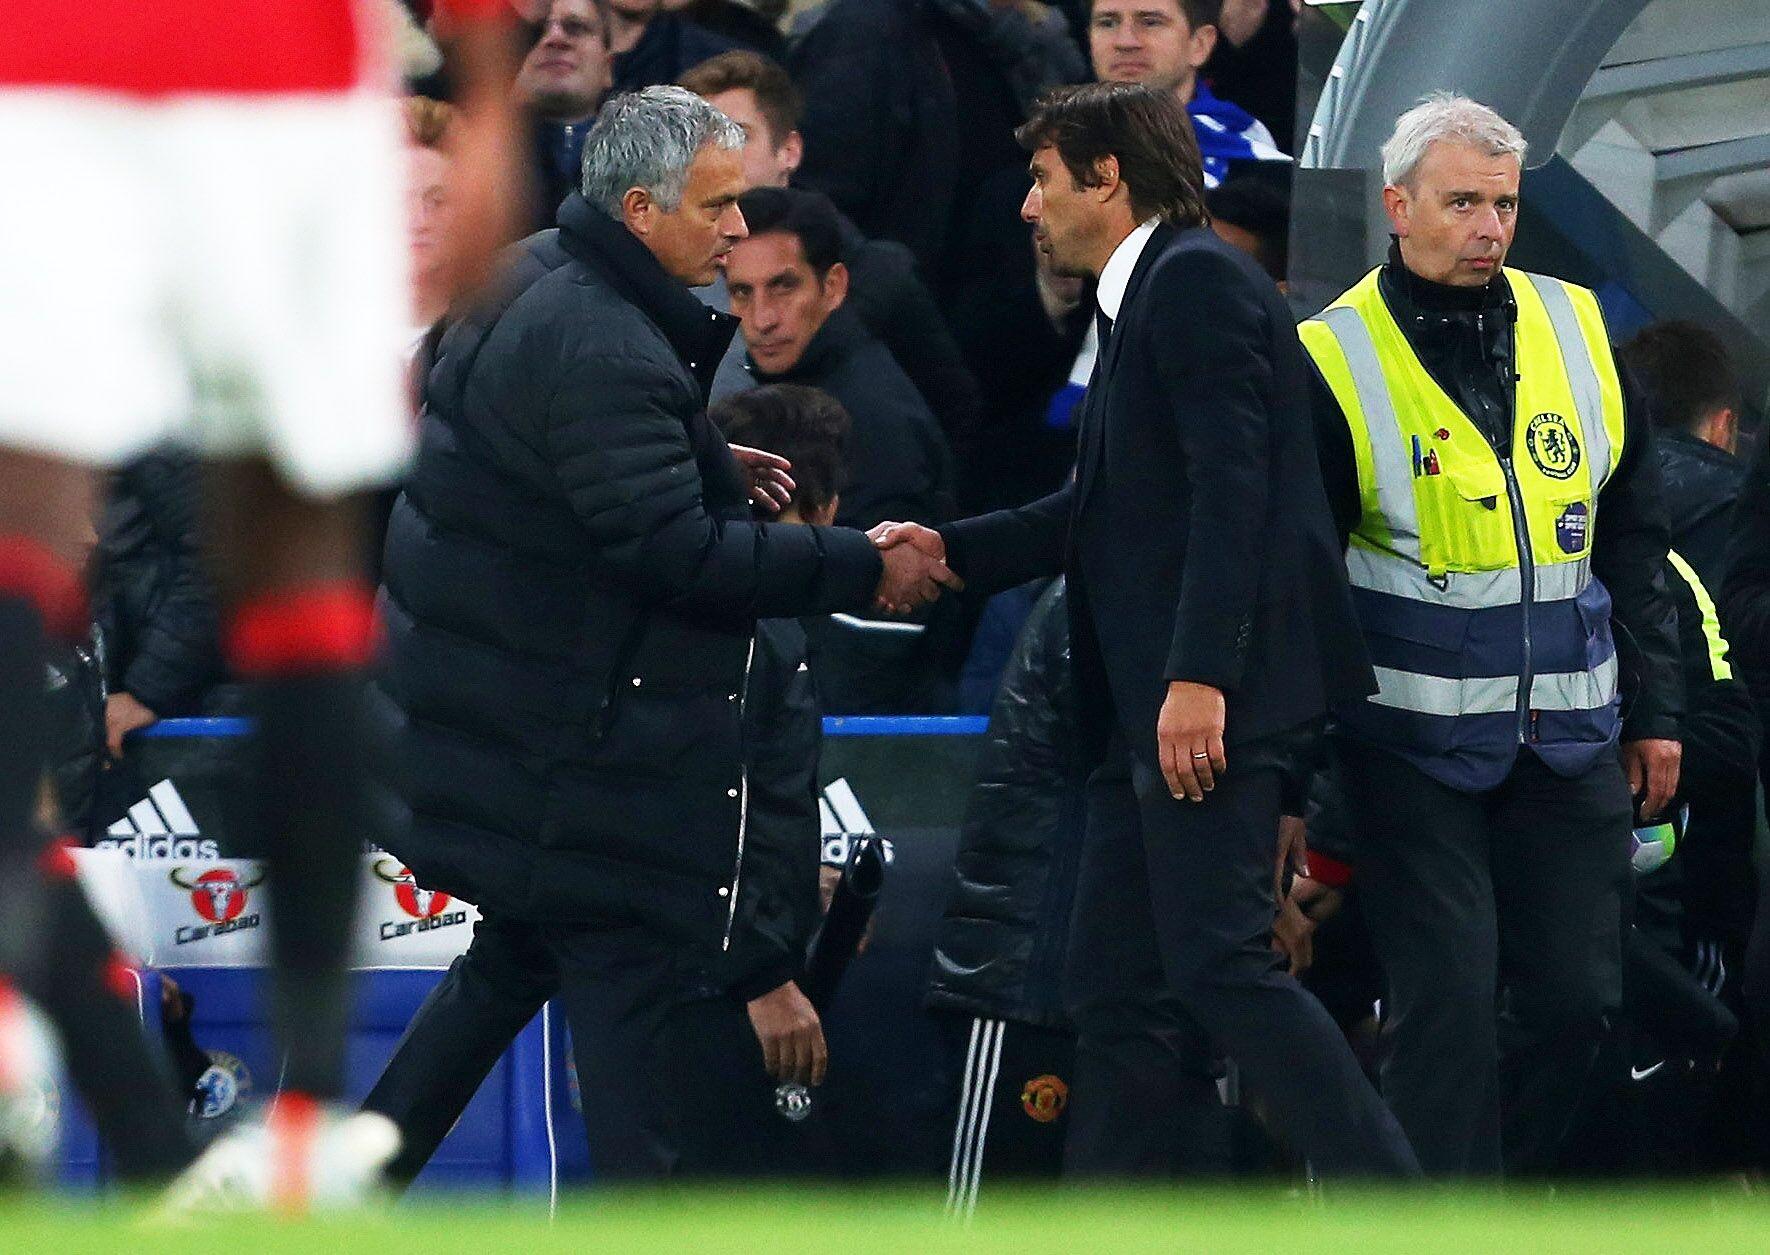 Chelsea Vs Manchester United Vs Fc Barcelona: Chelsea Host Manchester United: Who Is Going To Wembley?